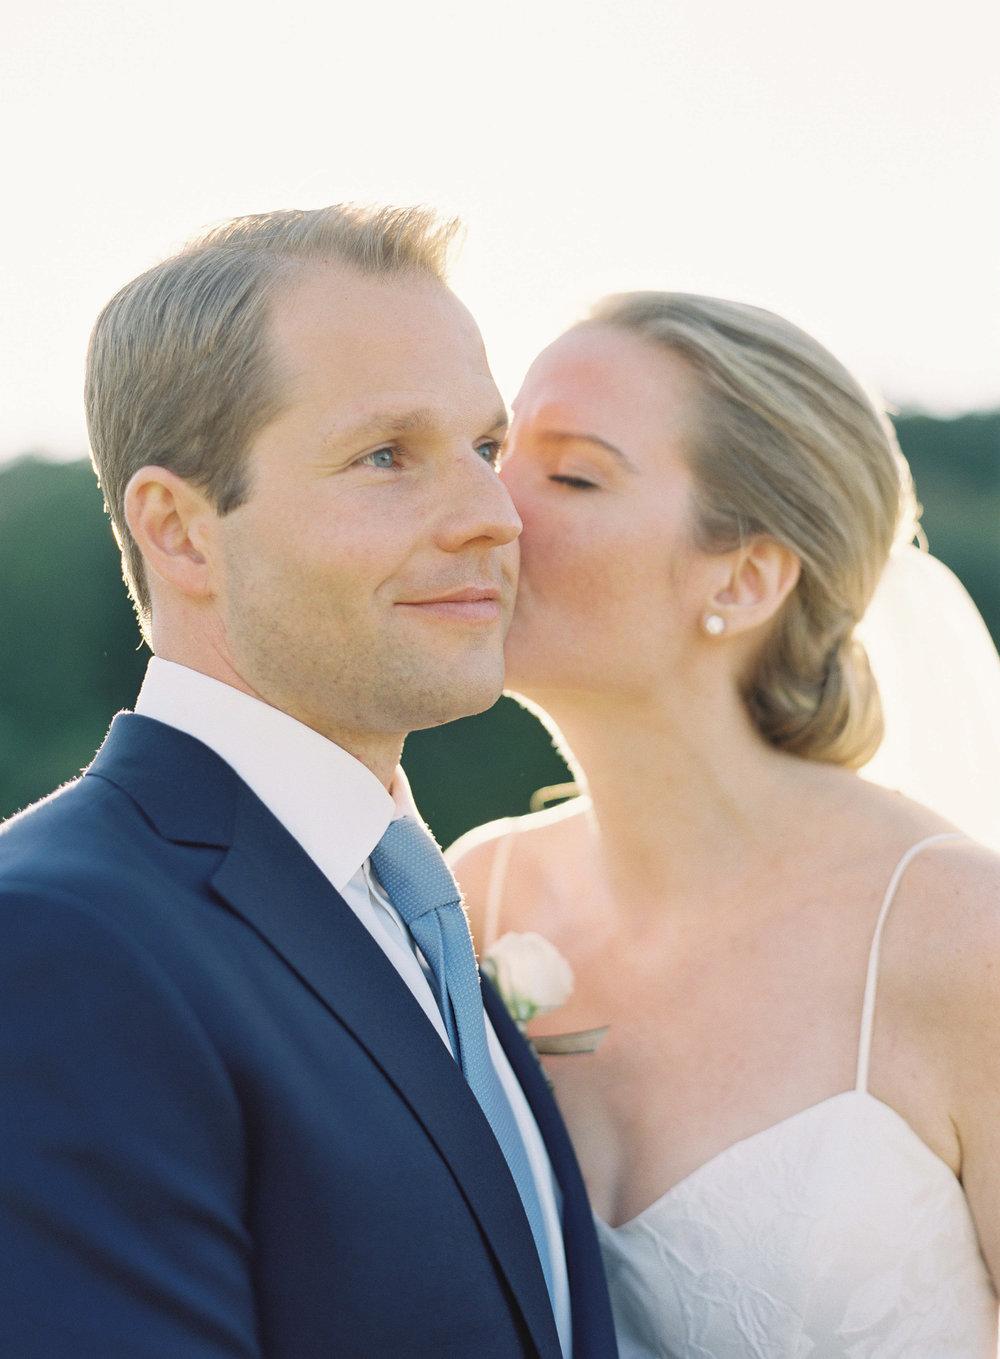 Connecticut-Wedding-18-Jen-Huang-20170909-KB-366-Jen_Huang-006806-R1-015.jpg